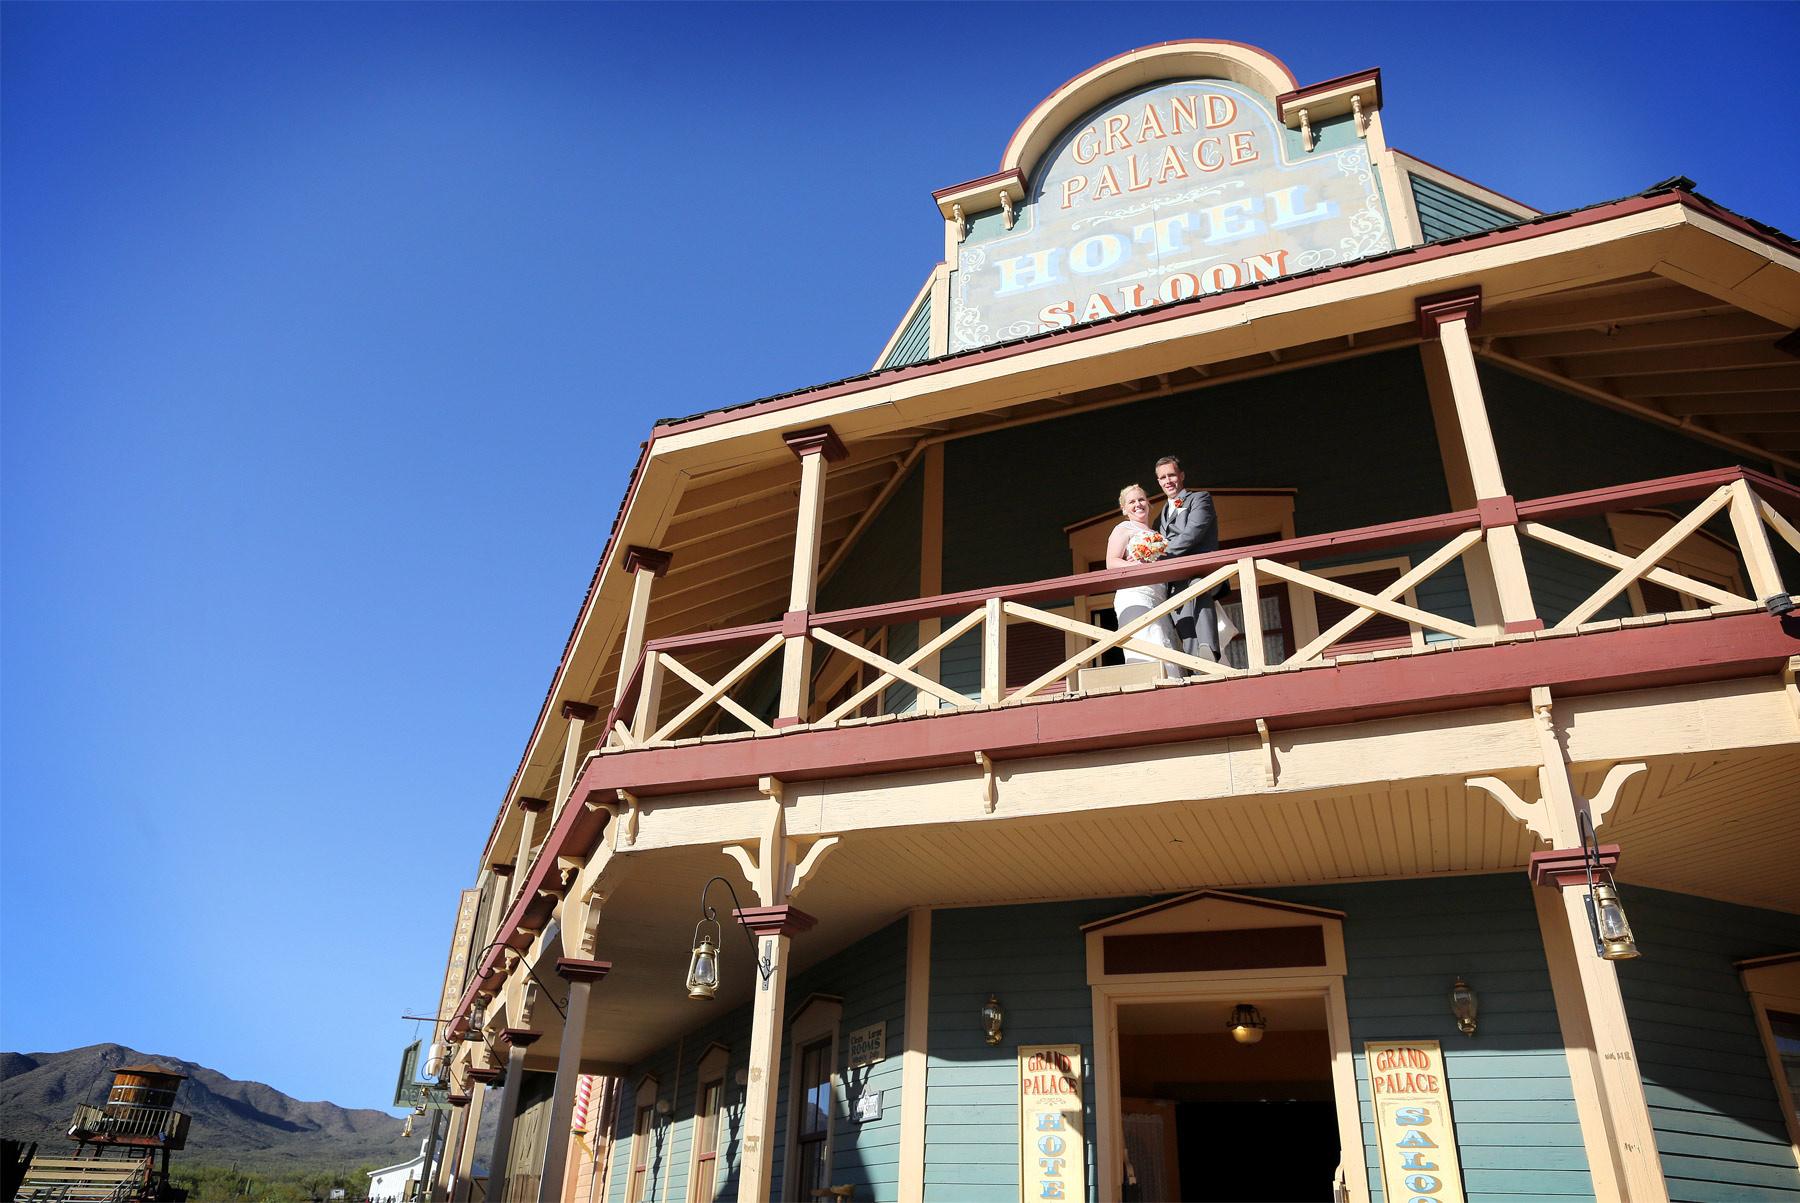 06-Tuscan-Arizona-Wedding-Photography-by-Vick-Photography-Destination-Wedding-Desert-Old-Tucson-Studios-Saloon-Elsa-and-Arthur.jpg